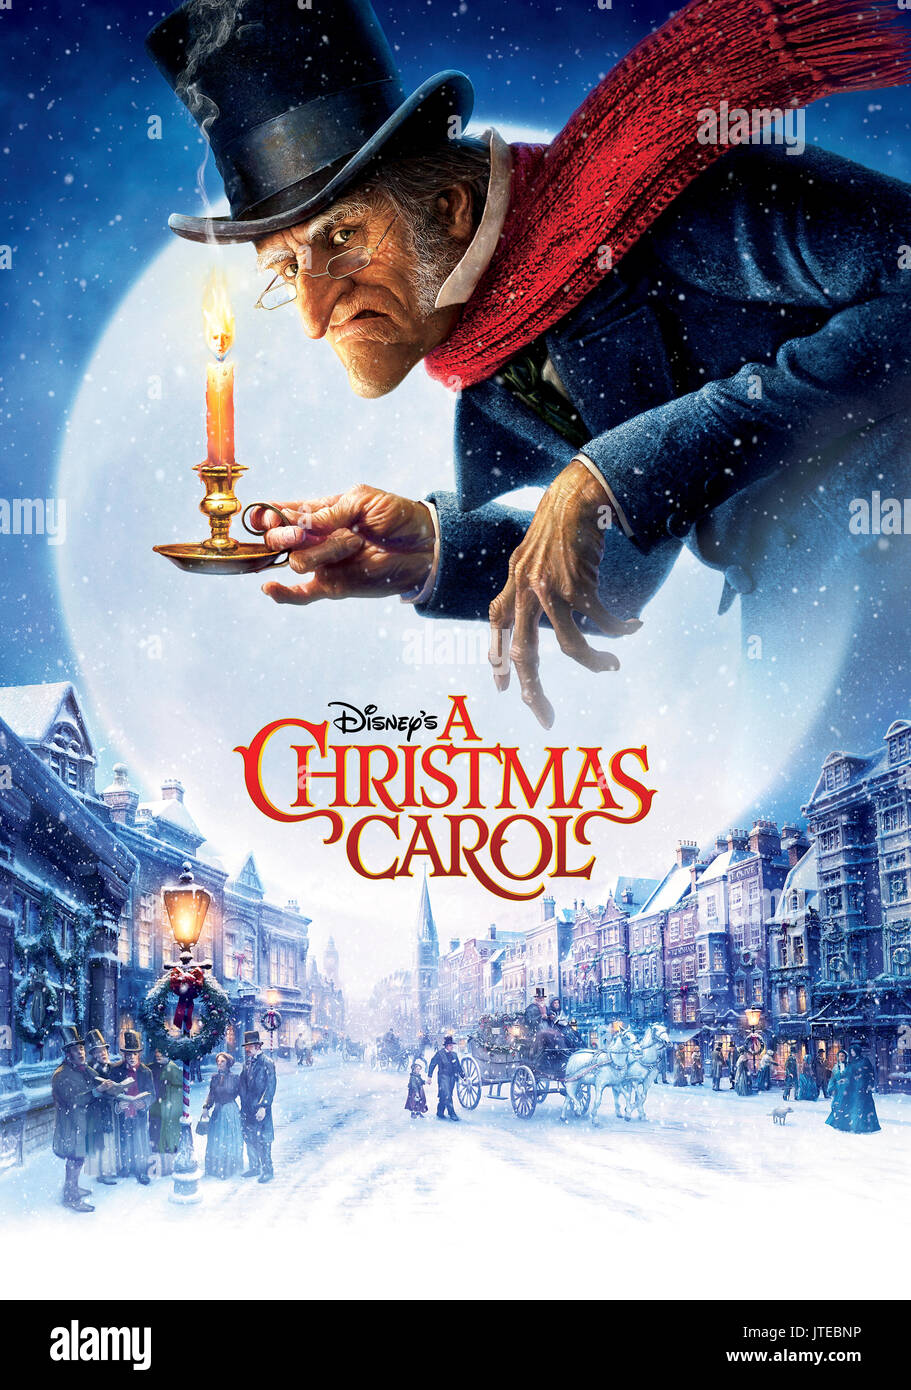 EBENEZER SCROOGE POSTER A CHRISTMAS CAROL (2009 Stockfoto, Bild ...